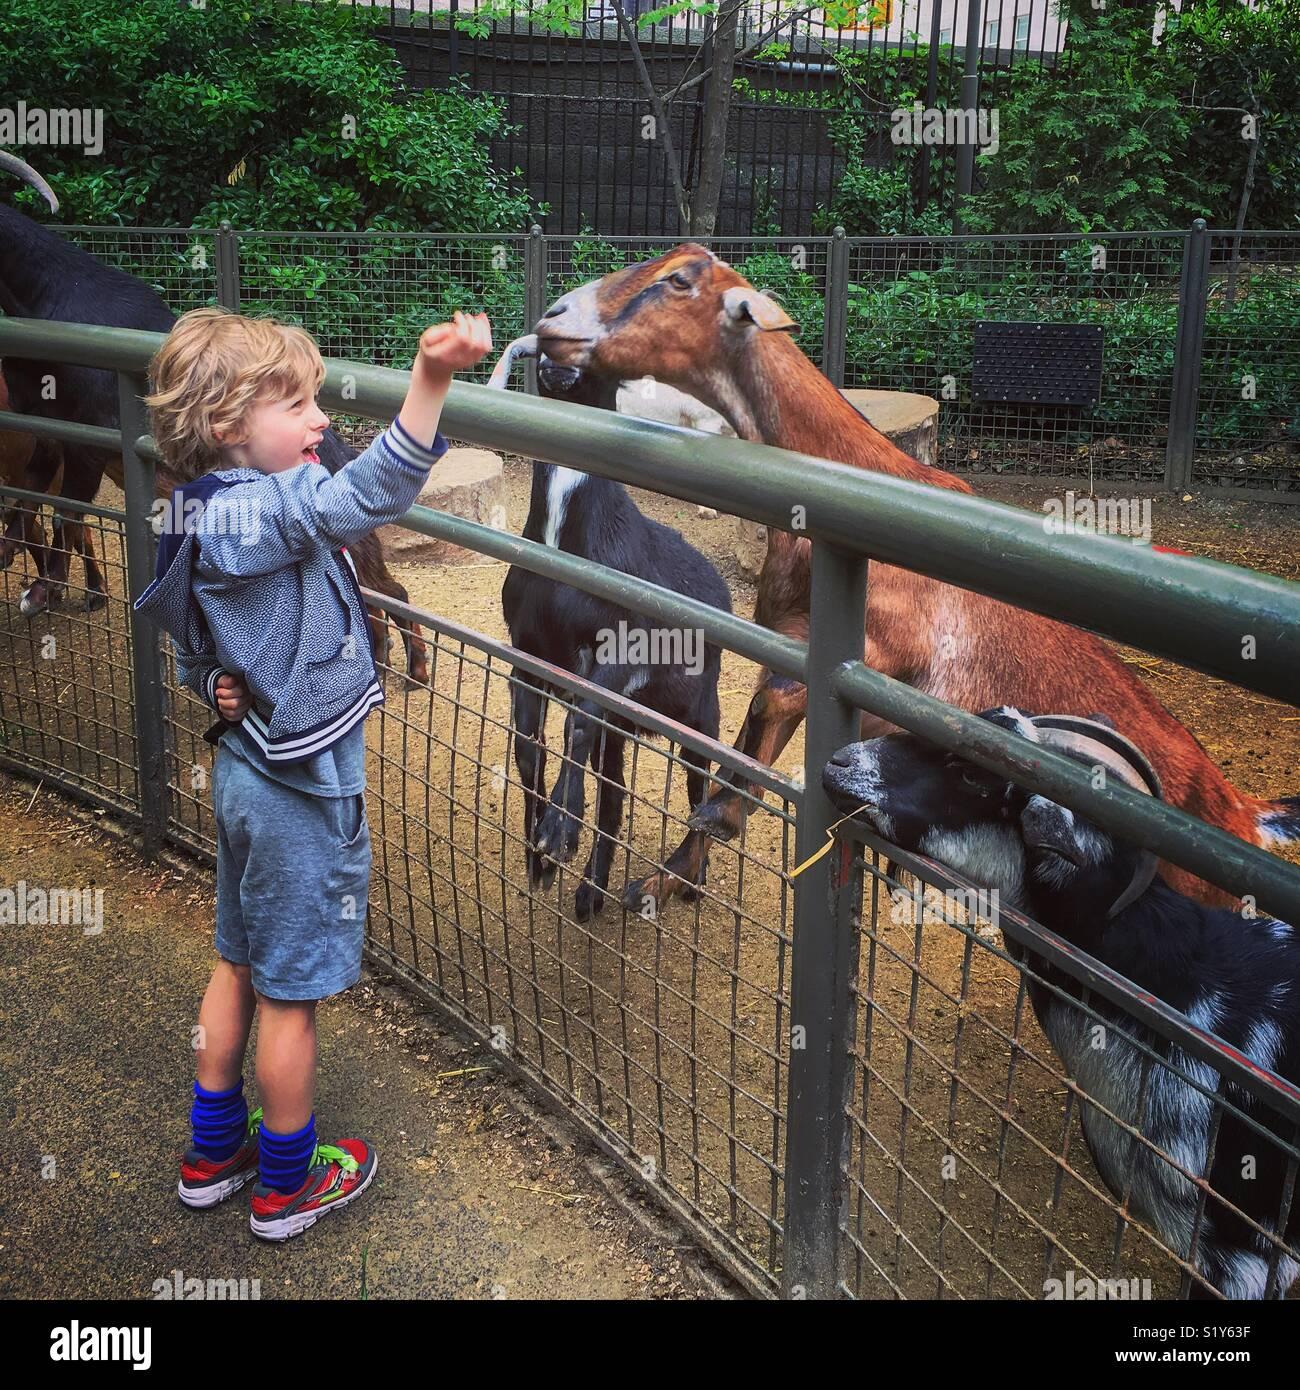 Boy feeding animals in petting zoo - Stock Image